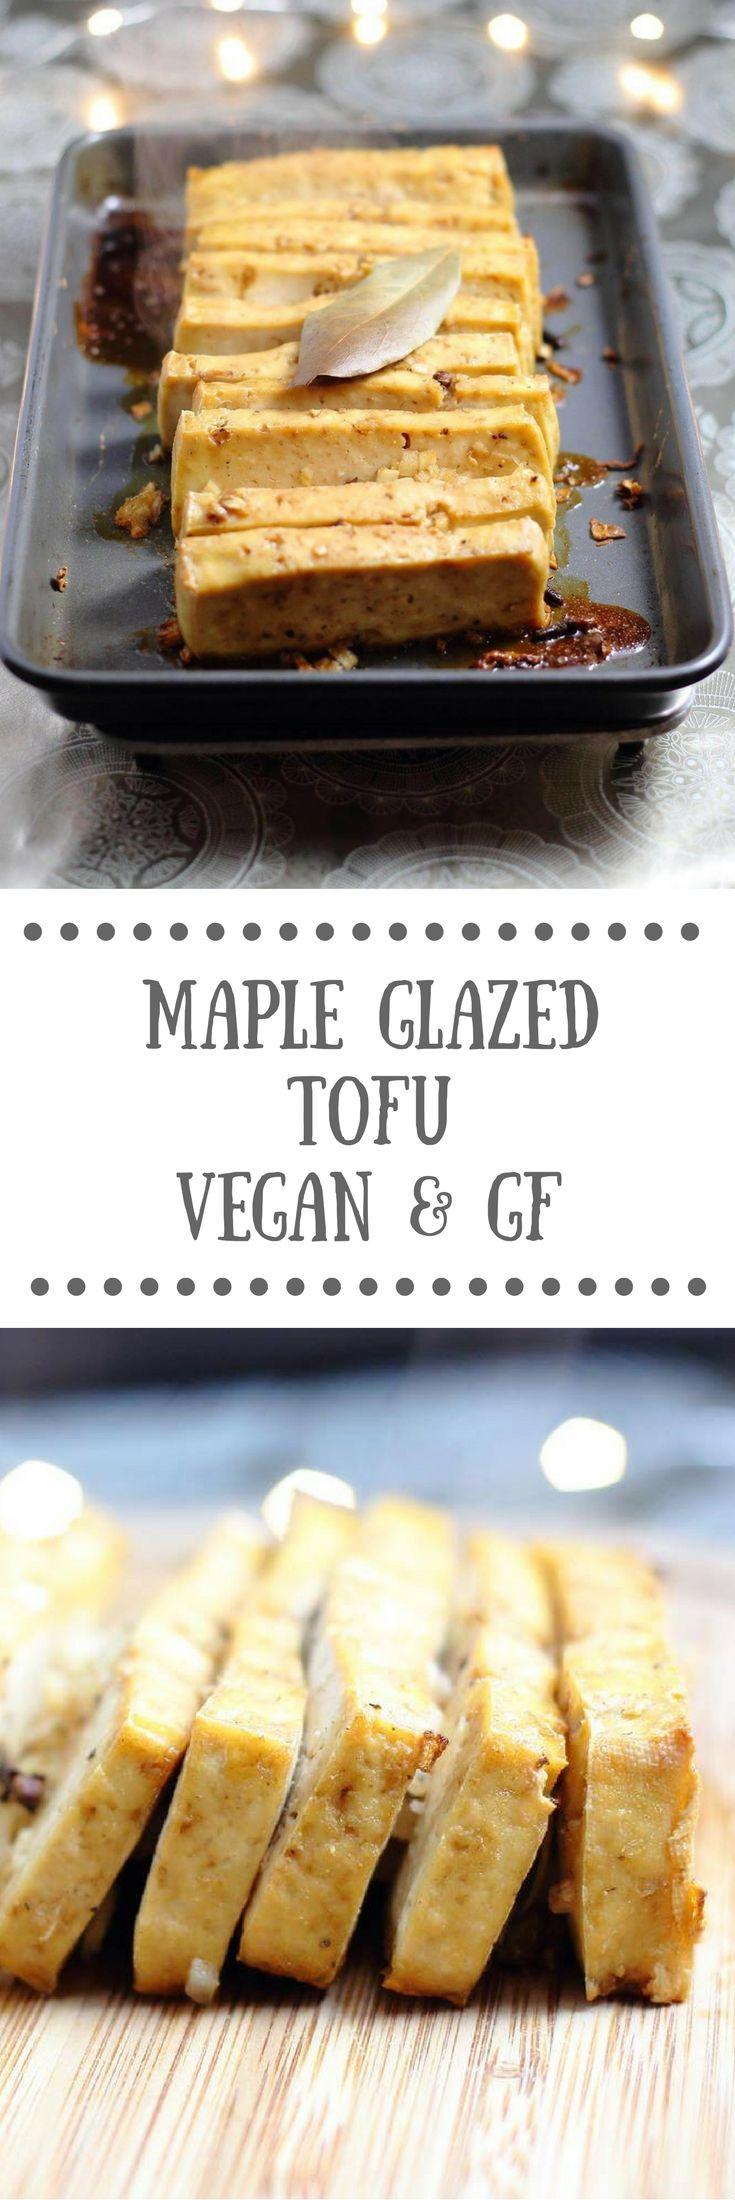 Maple Glazed Tofu - Vegan & Gluten-free Recipe | Perfect for a festive veggie Christmas feast.